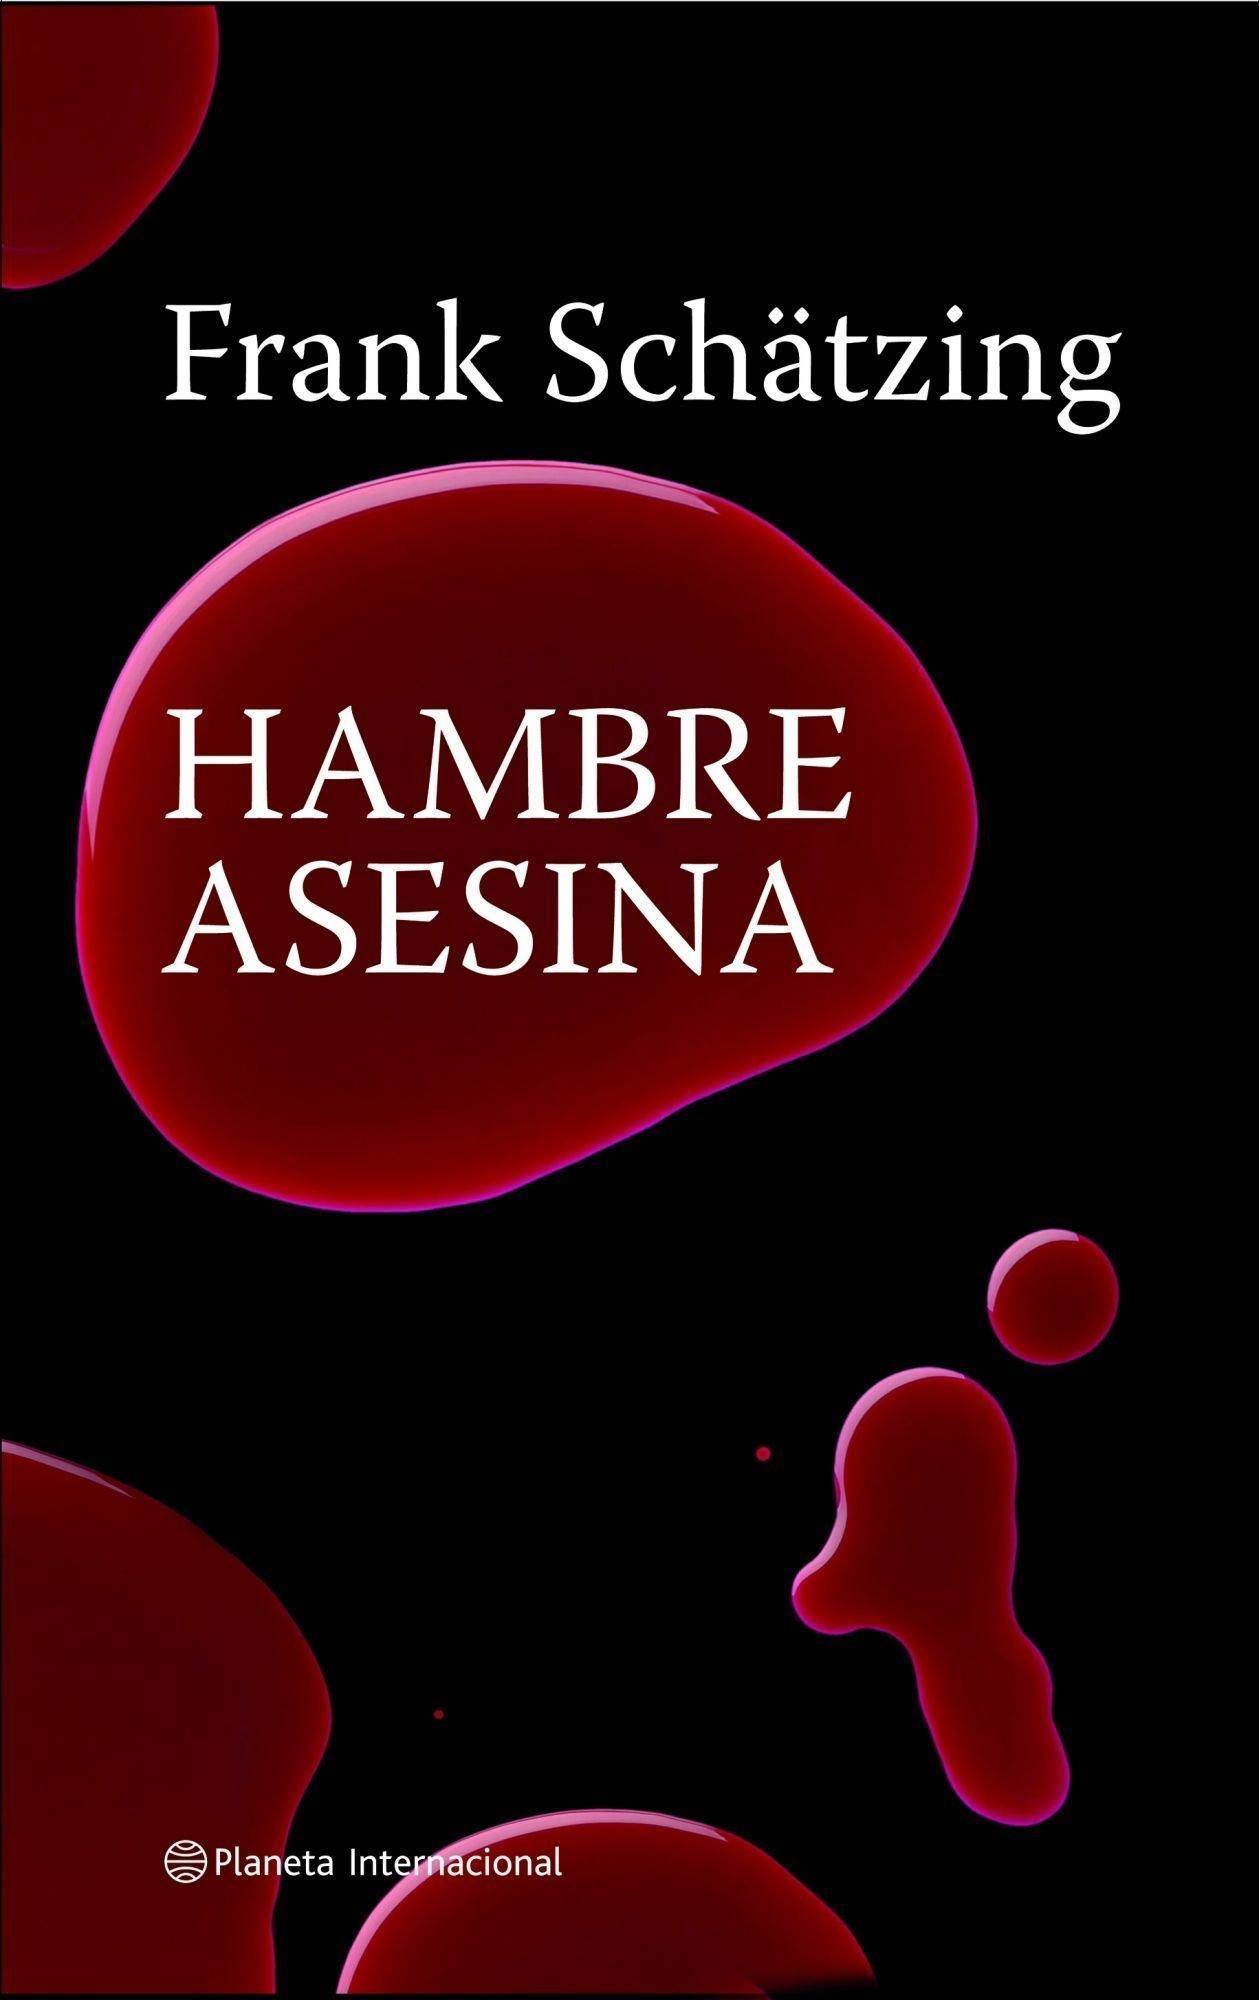 Hambre asesina: Frank Schätzing: 9788408082248: Amazon.com: Books